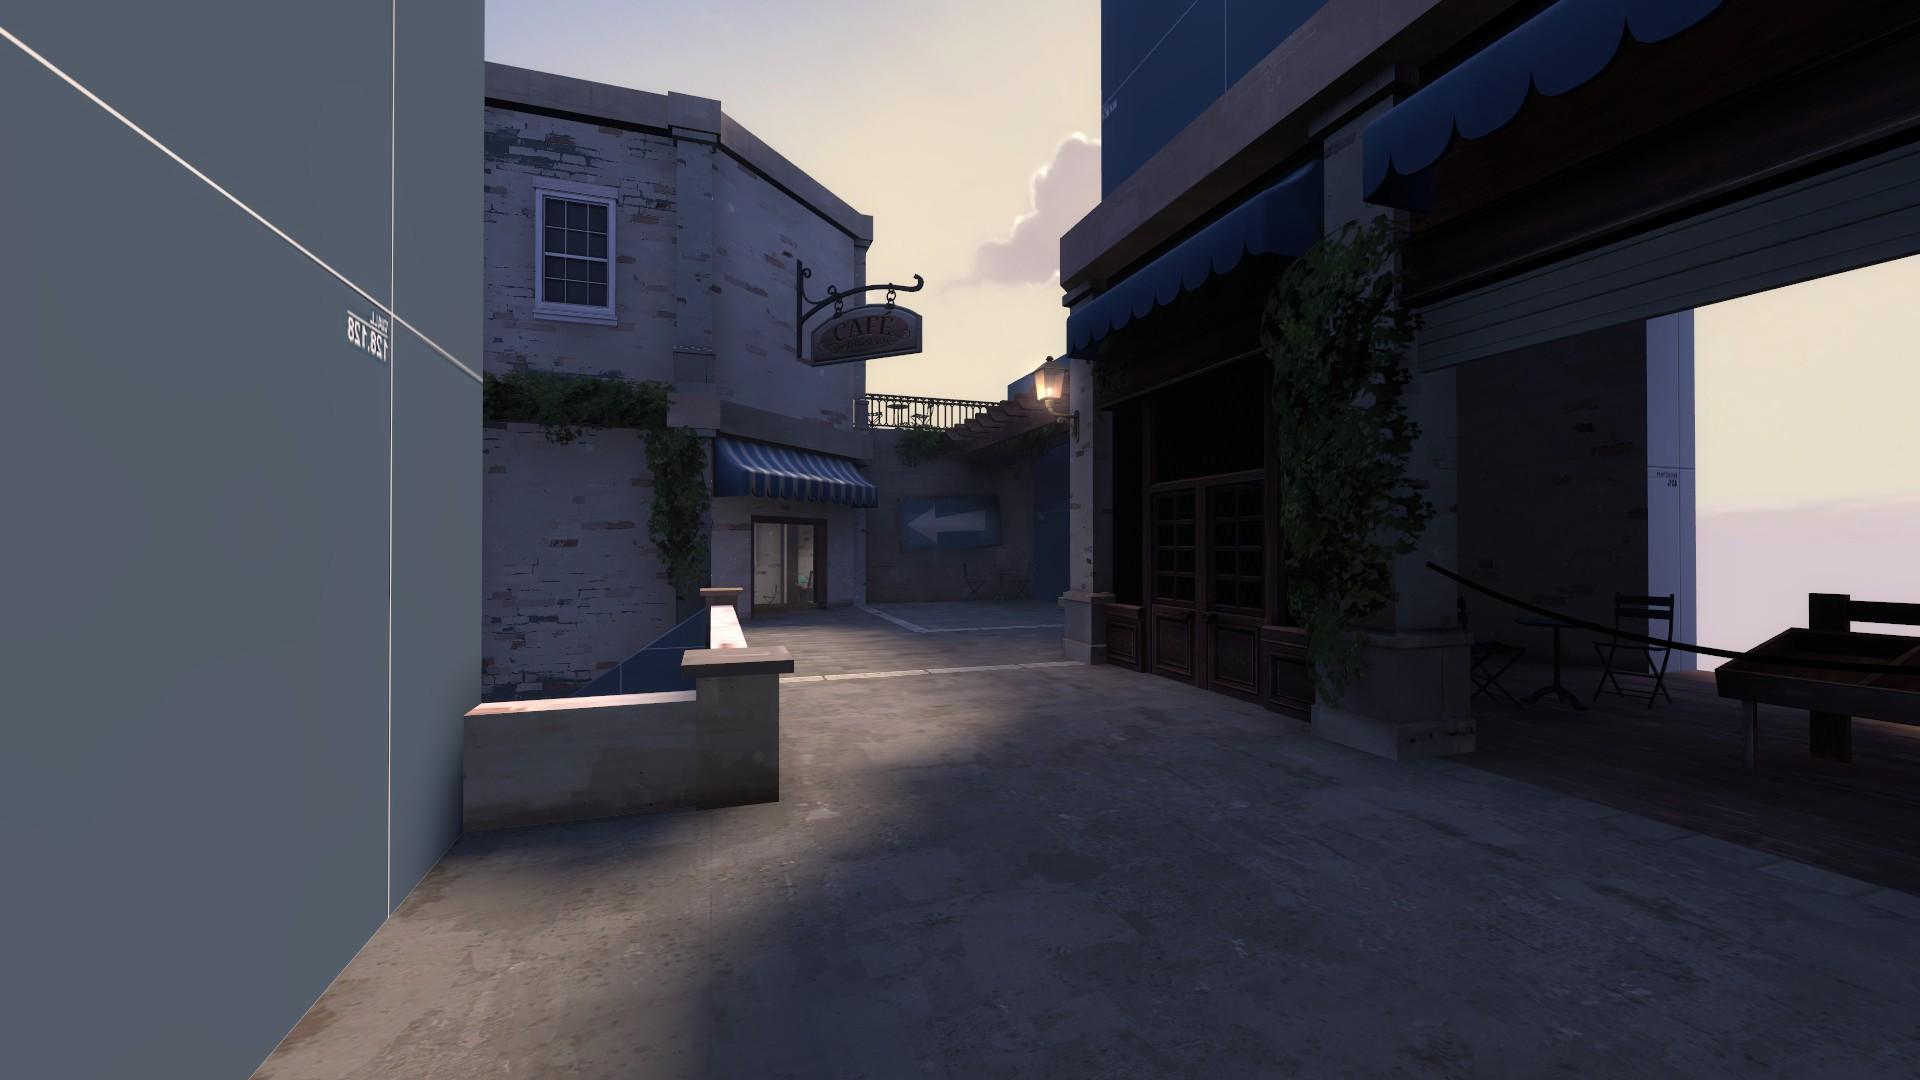 koth_terrace_a80006.jpg